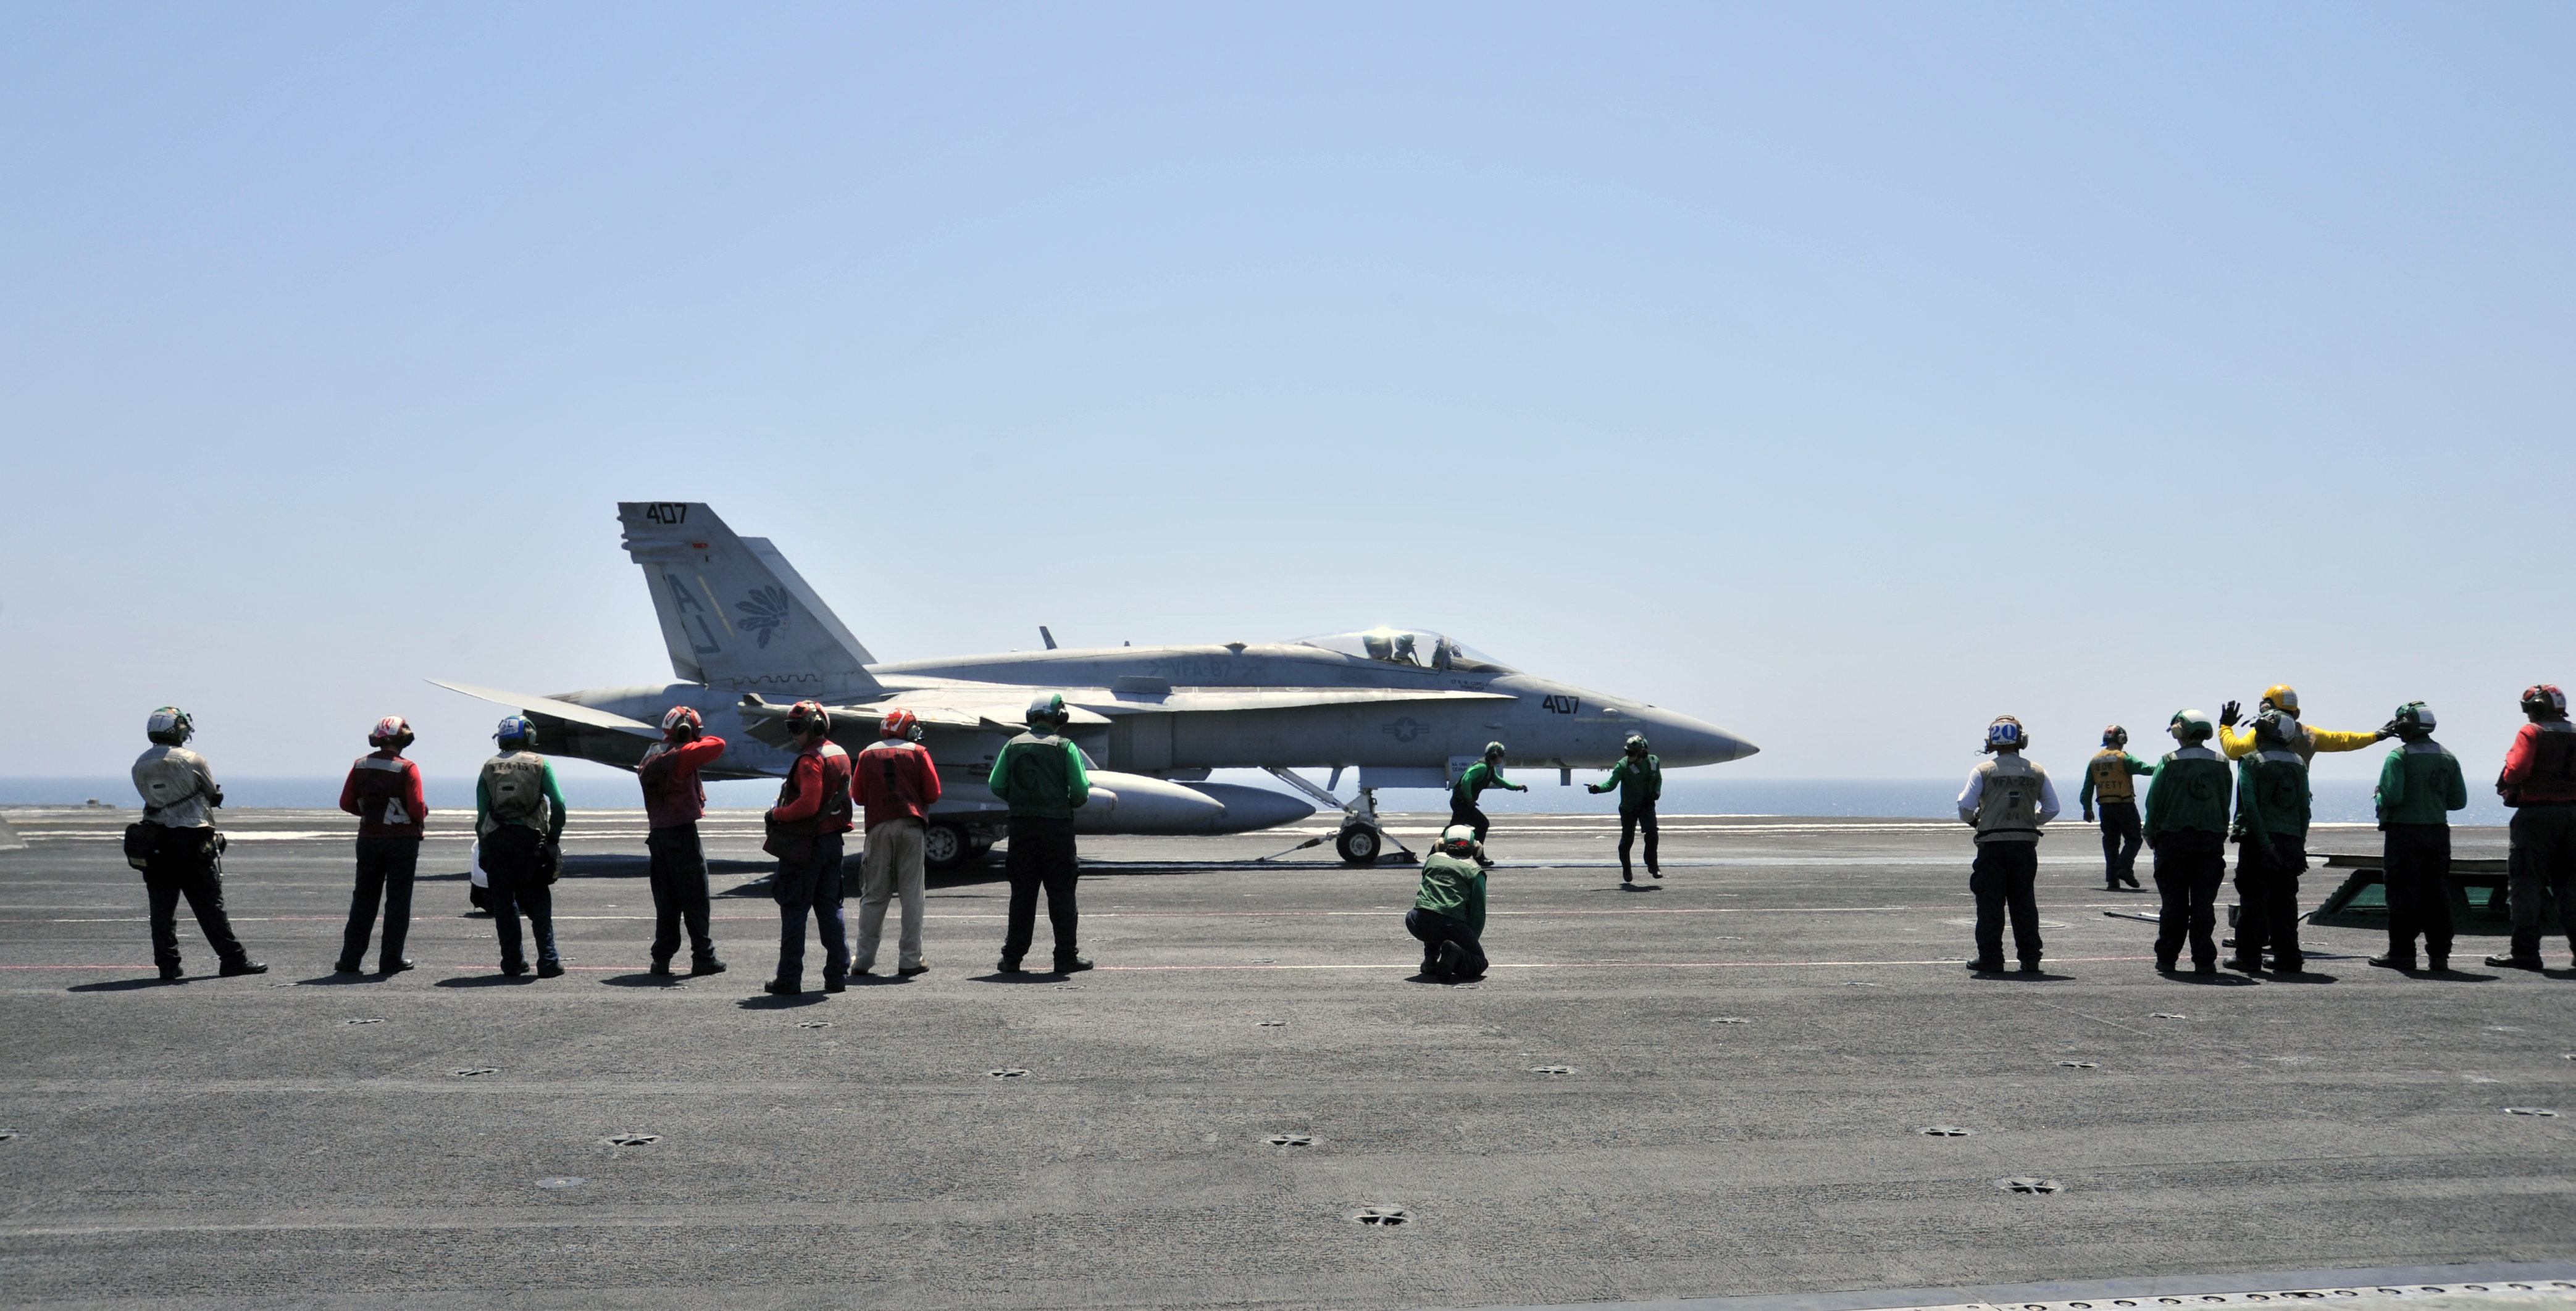 FA-18C Fighter Iraq Airstrikes August 7 2014.JPG